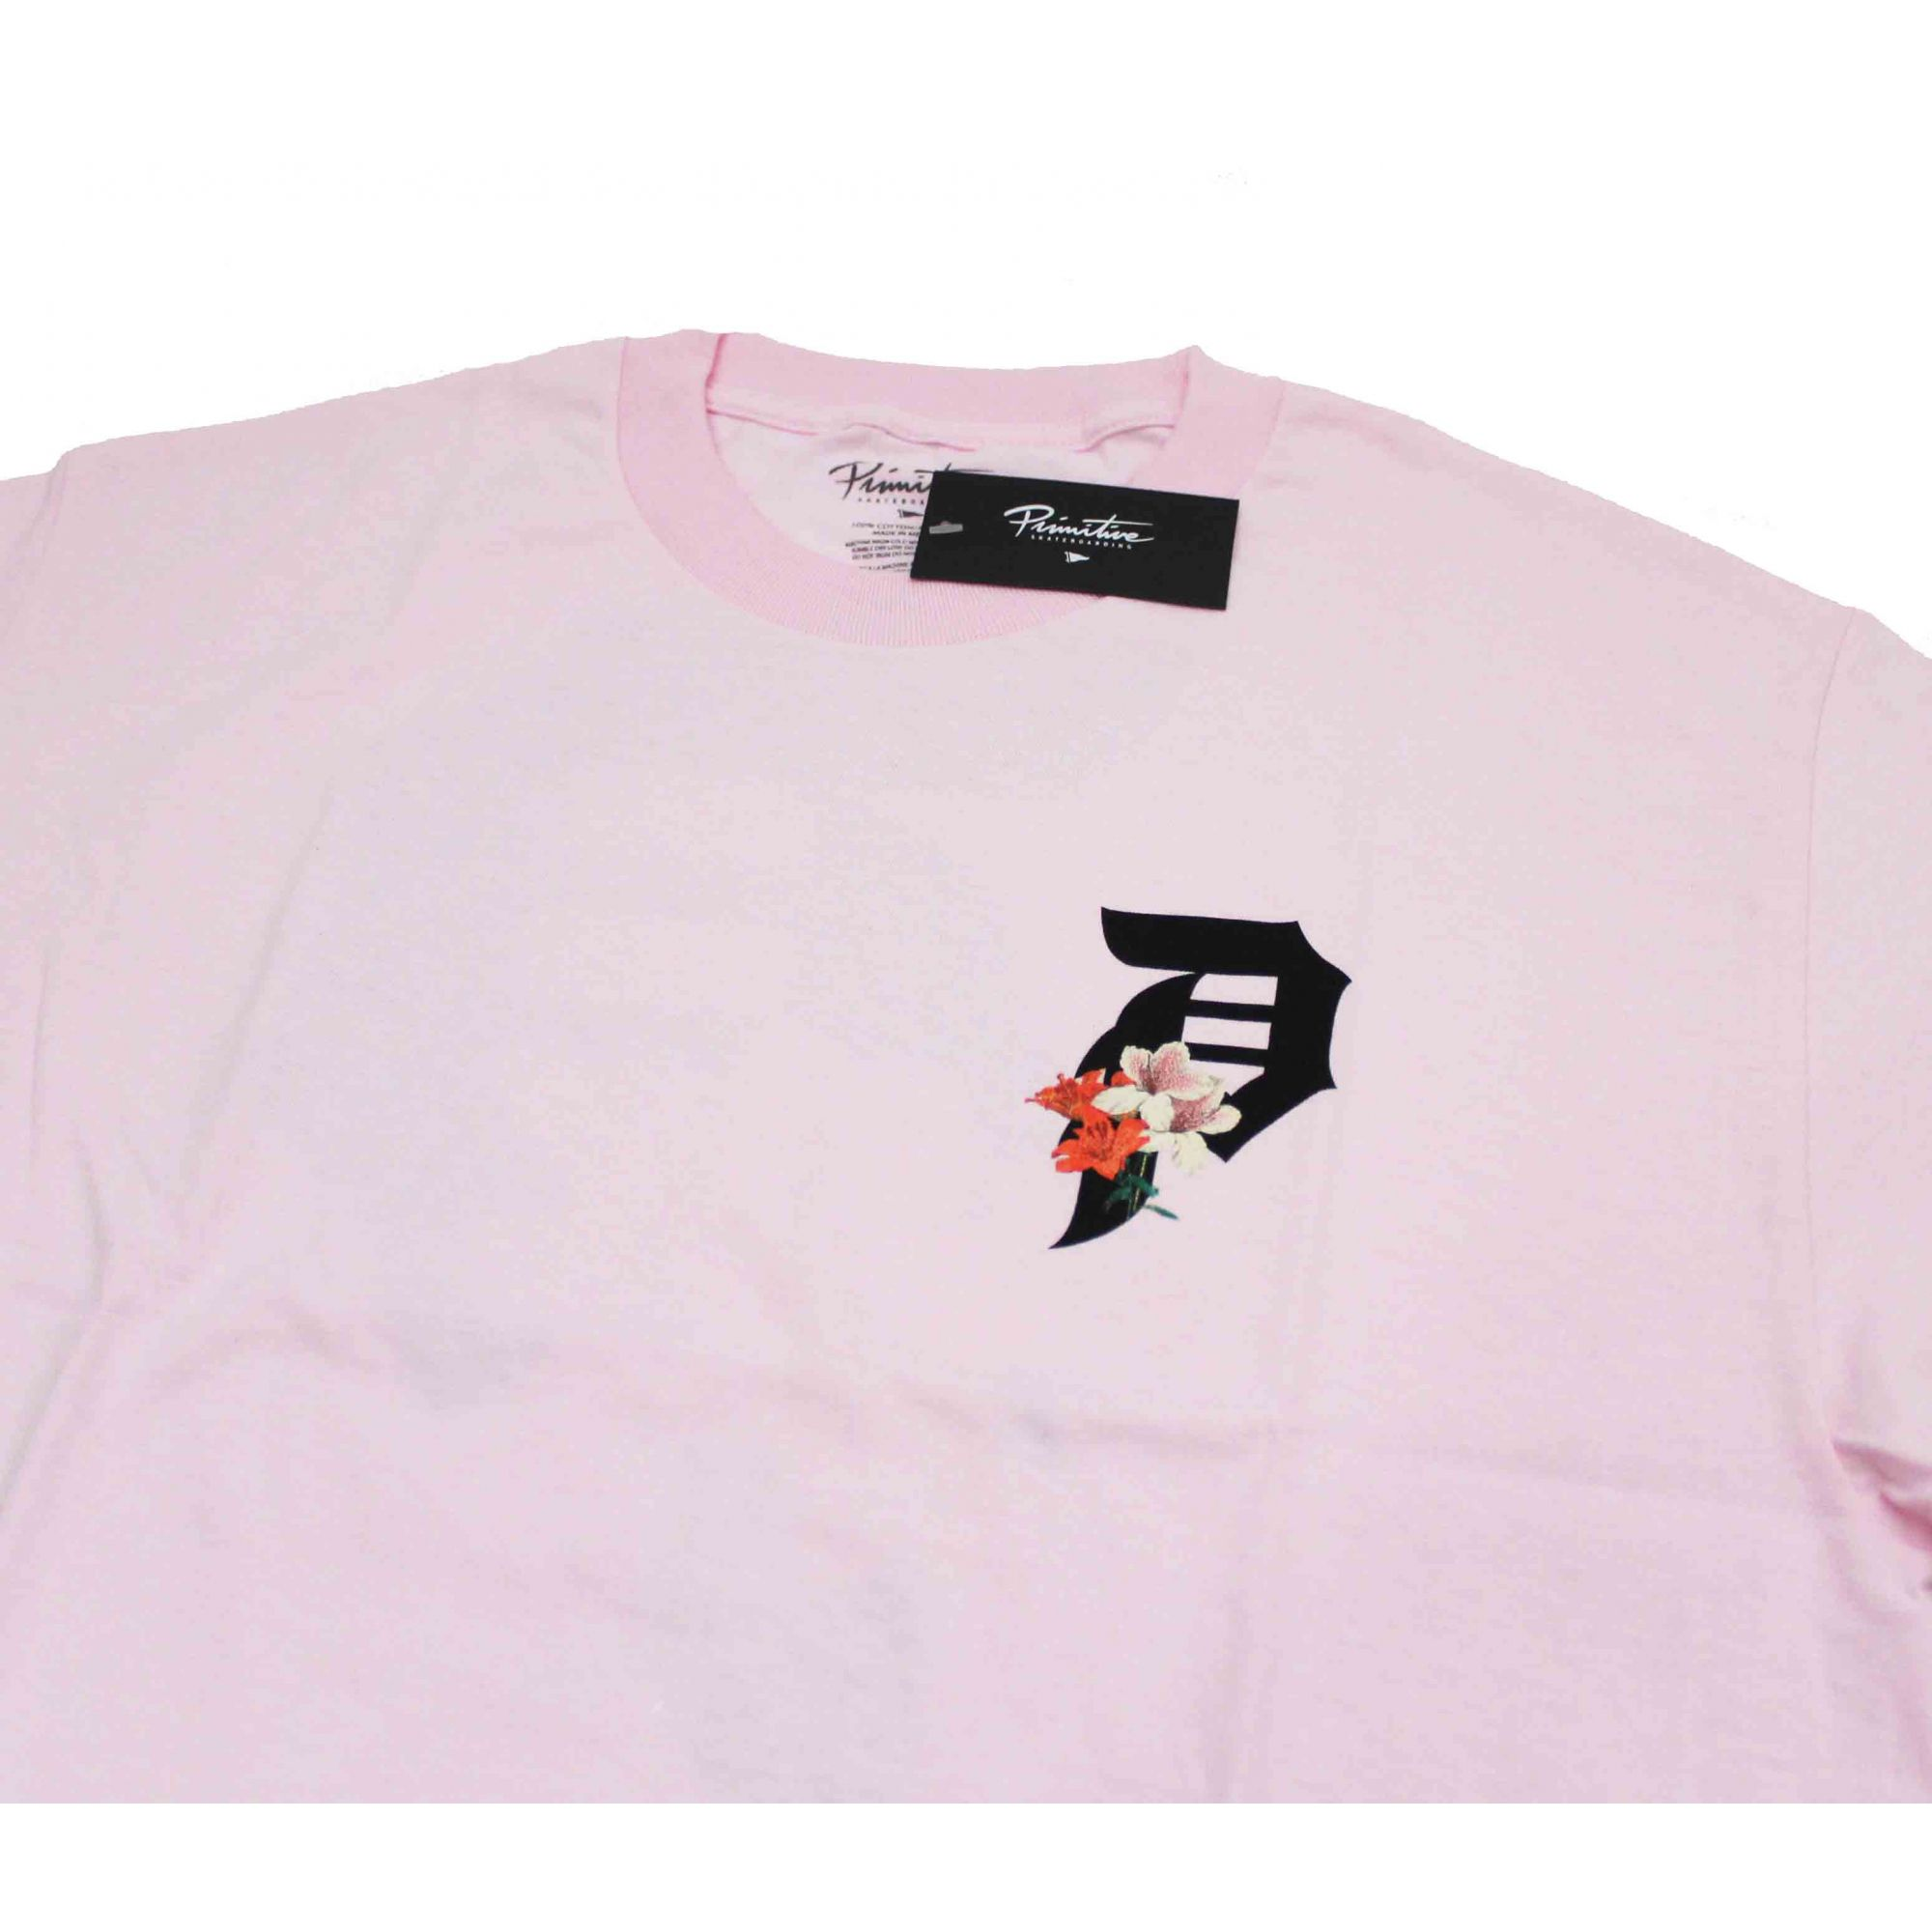 99eedcfc ... Camiseta Primitive Dirty P Lily Tee Pink - Steezy